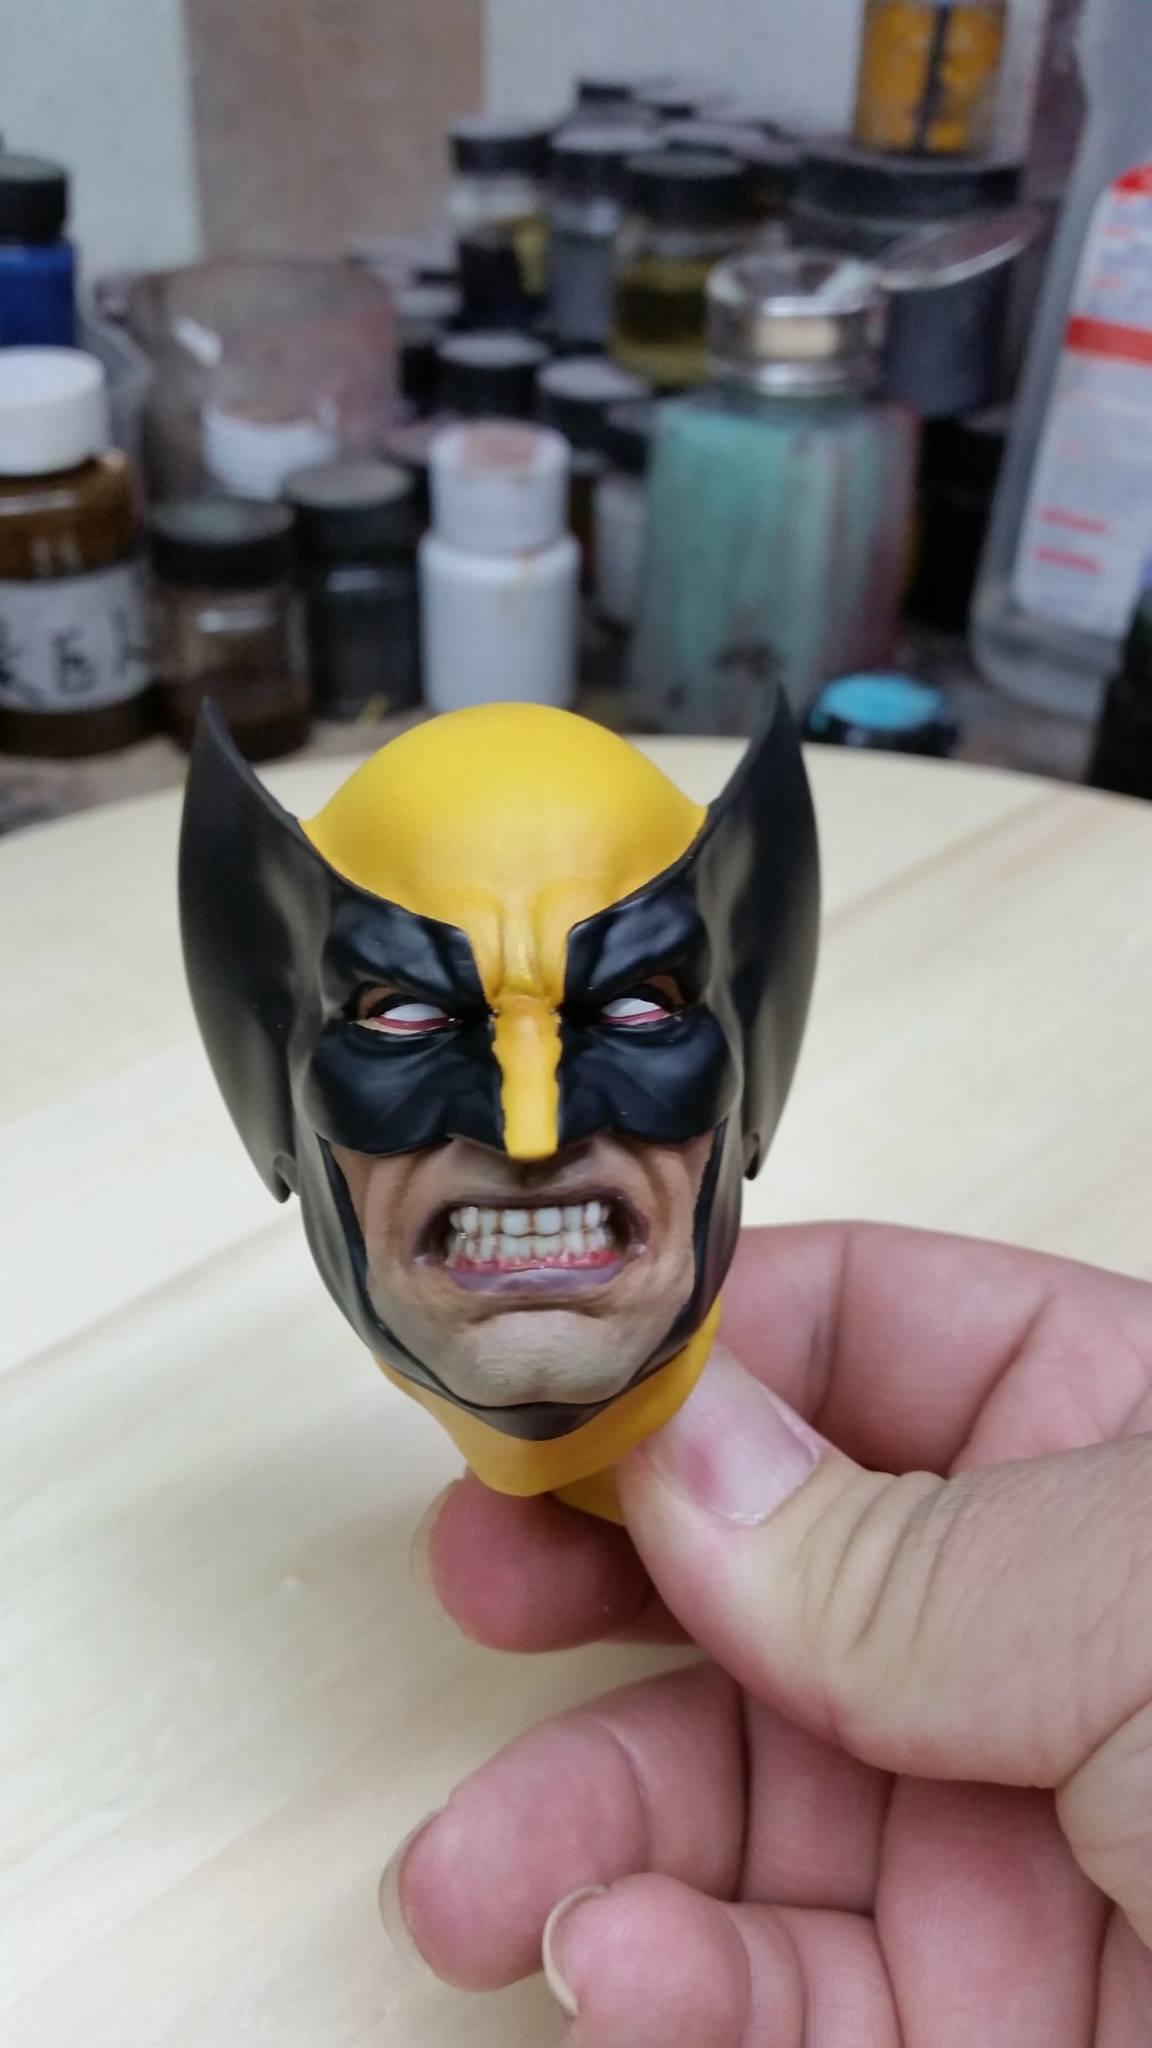 Premium Collectibles : Wolverine - Comics Version - Page 2 2238691049789114171089951764623844187022719851547o